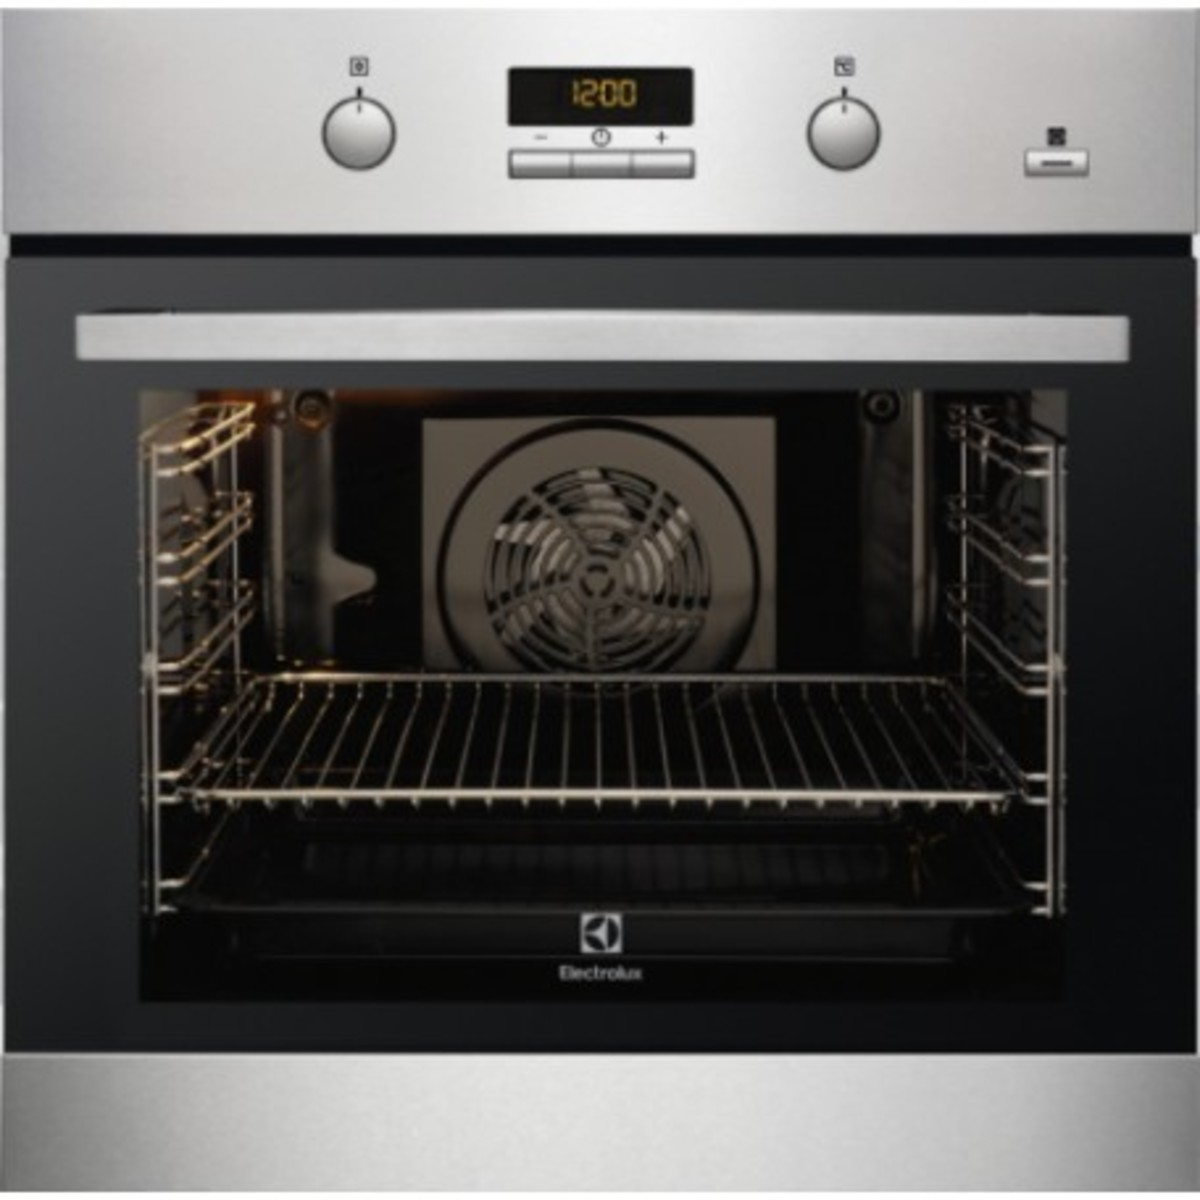 EOB3414AOX 60cm 2980W Built-in Oven (2-year Warranty)